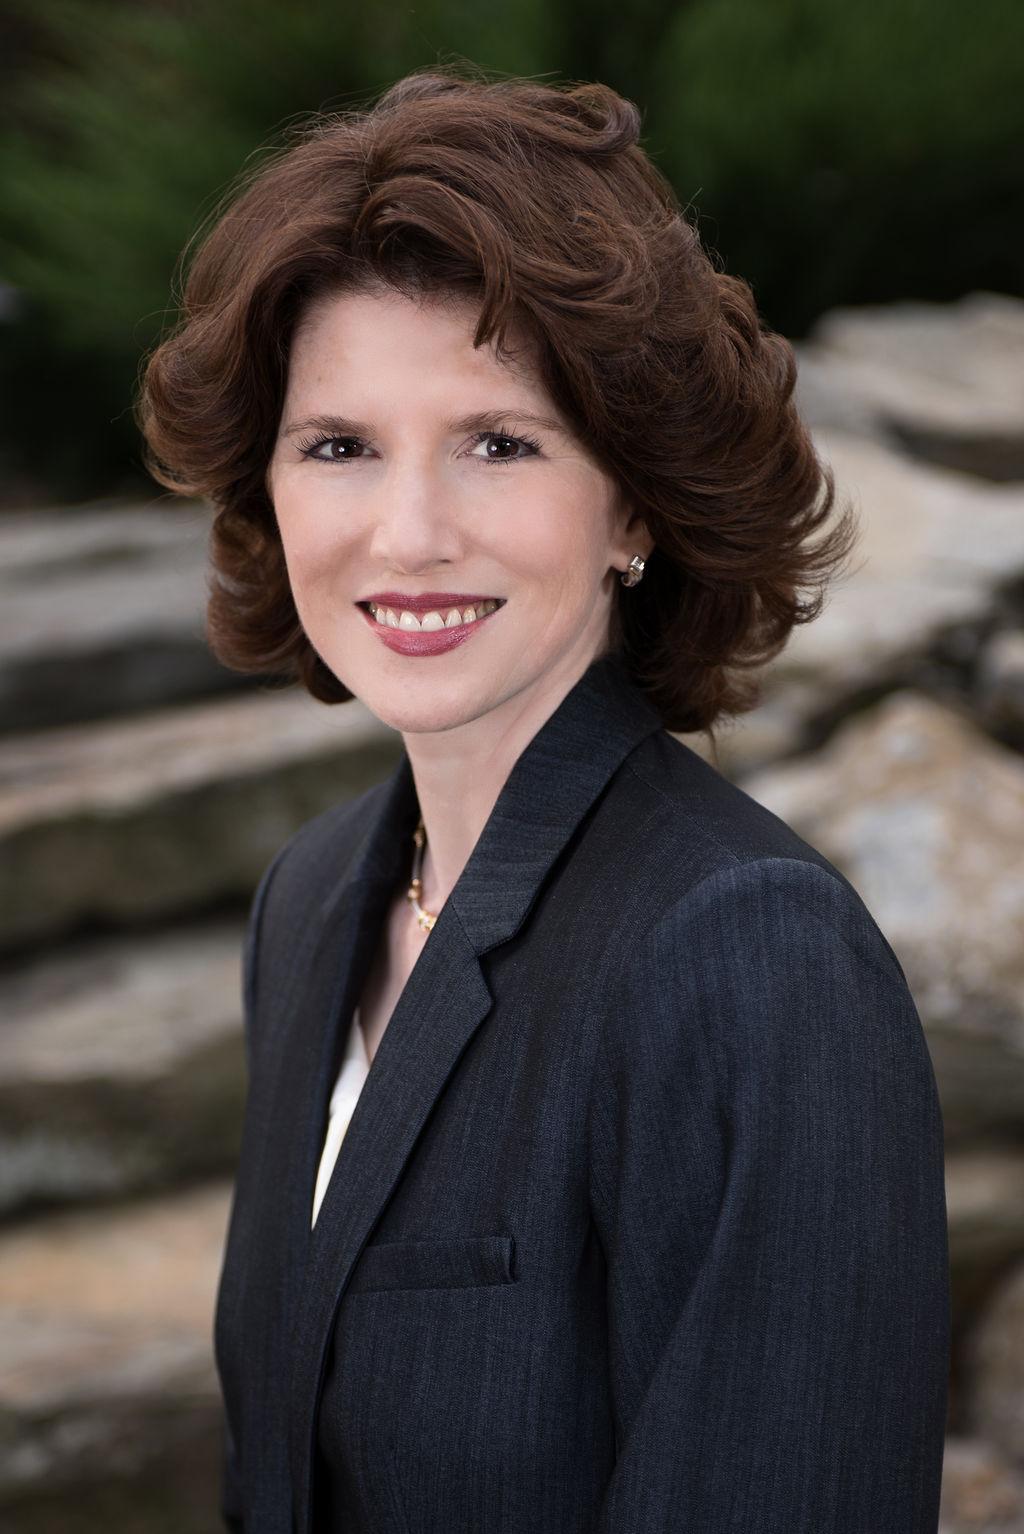 Johanna Wiseman